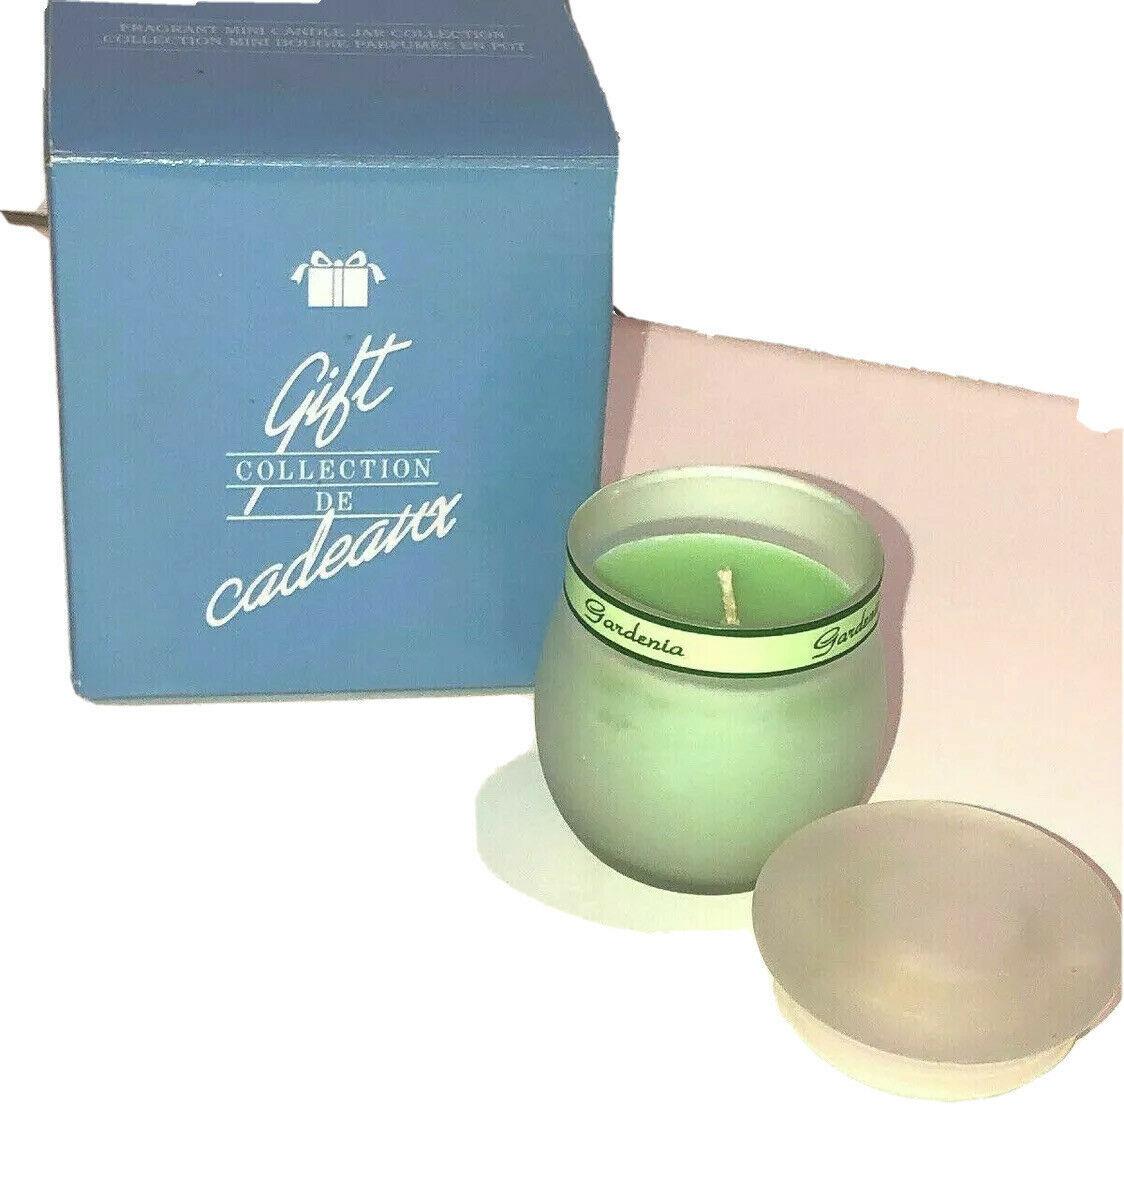 Avon Fragrant Mini Candle Jar Collection Gardenia Green Gift Collection 523081 - $18.80